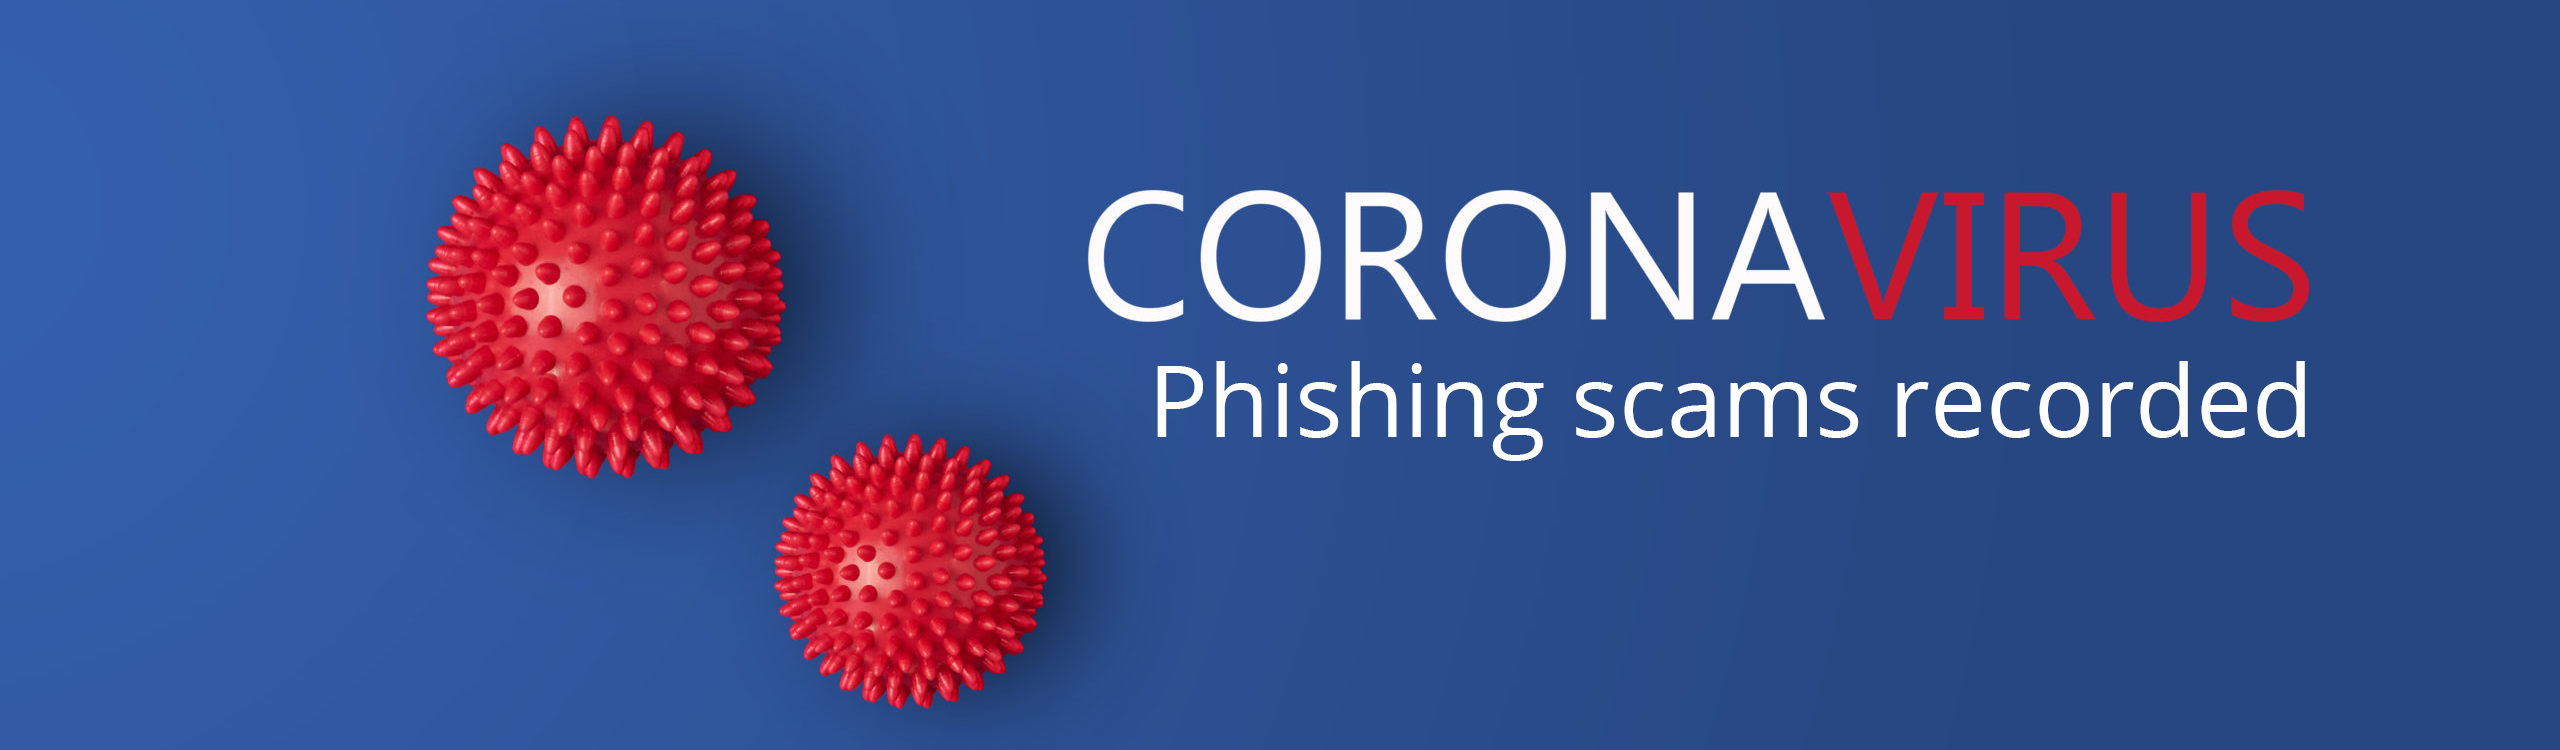 Cyber-Criminals Cashing in on Coronavirus